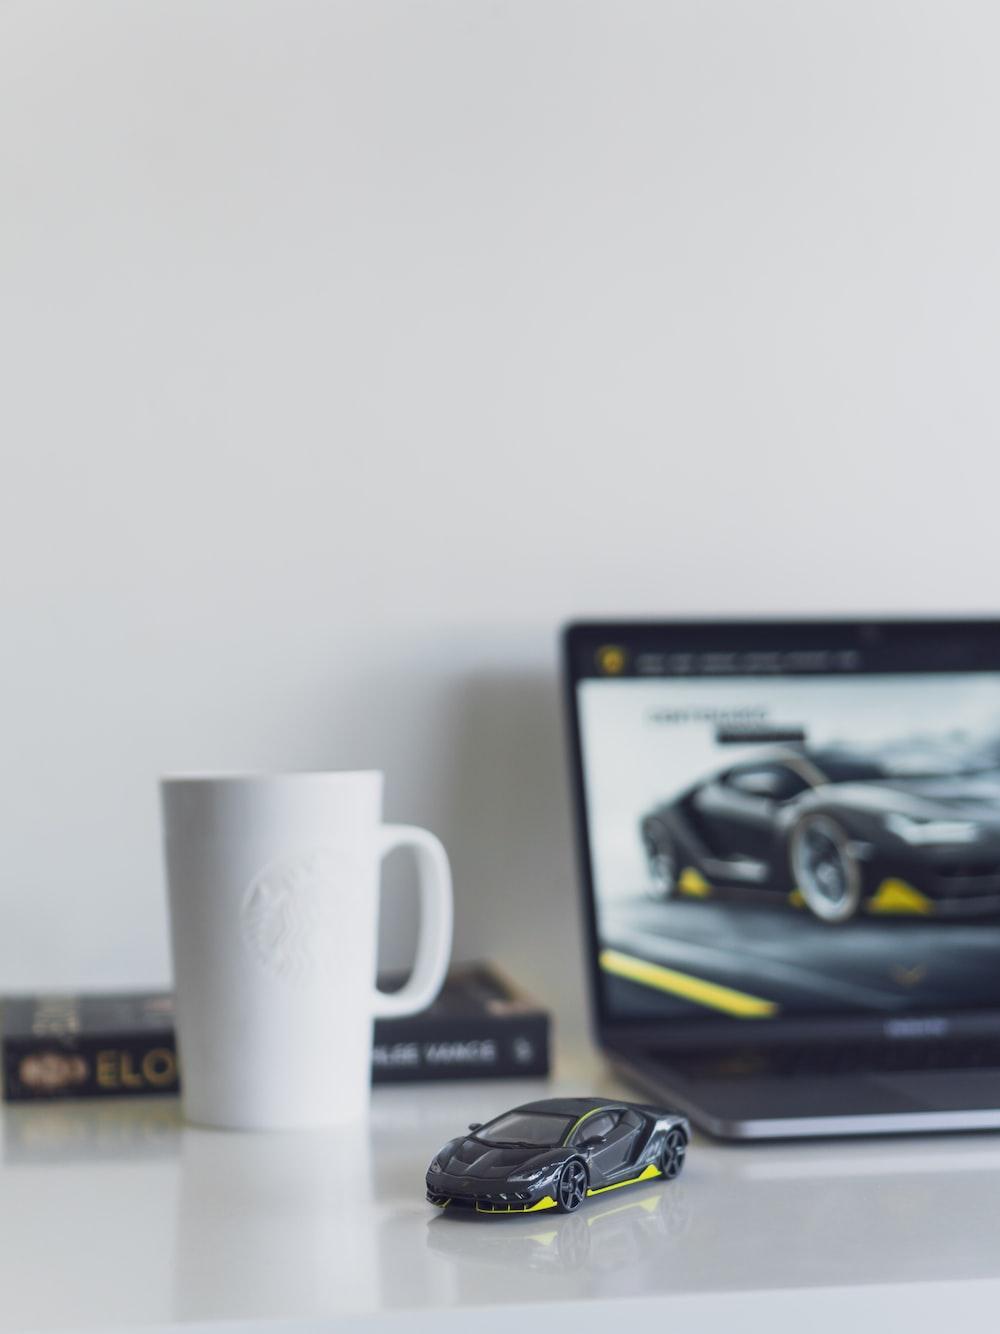 black sports car miniature beside white mug